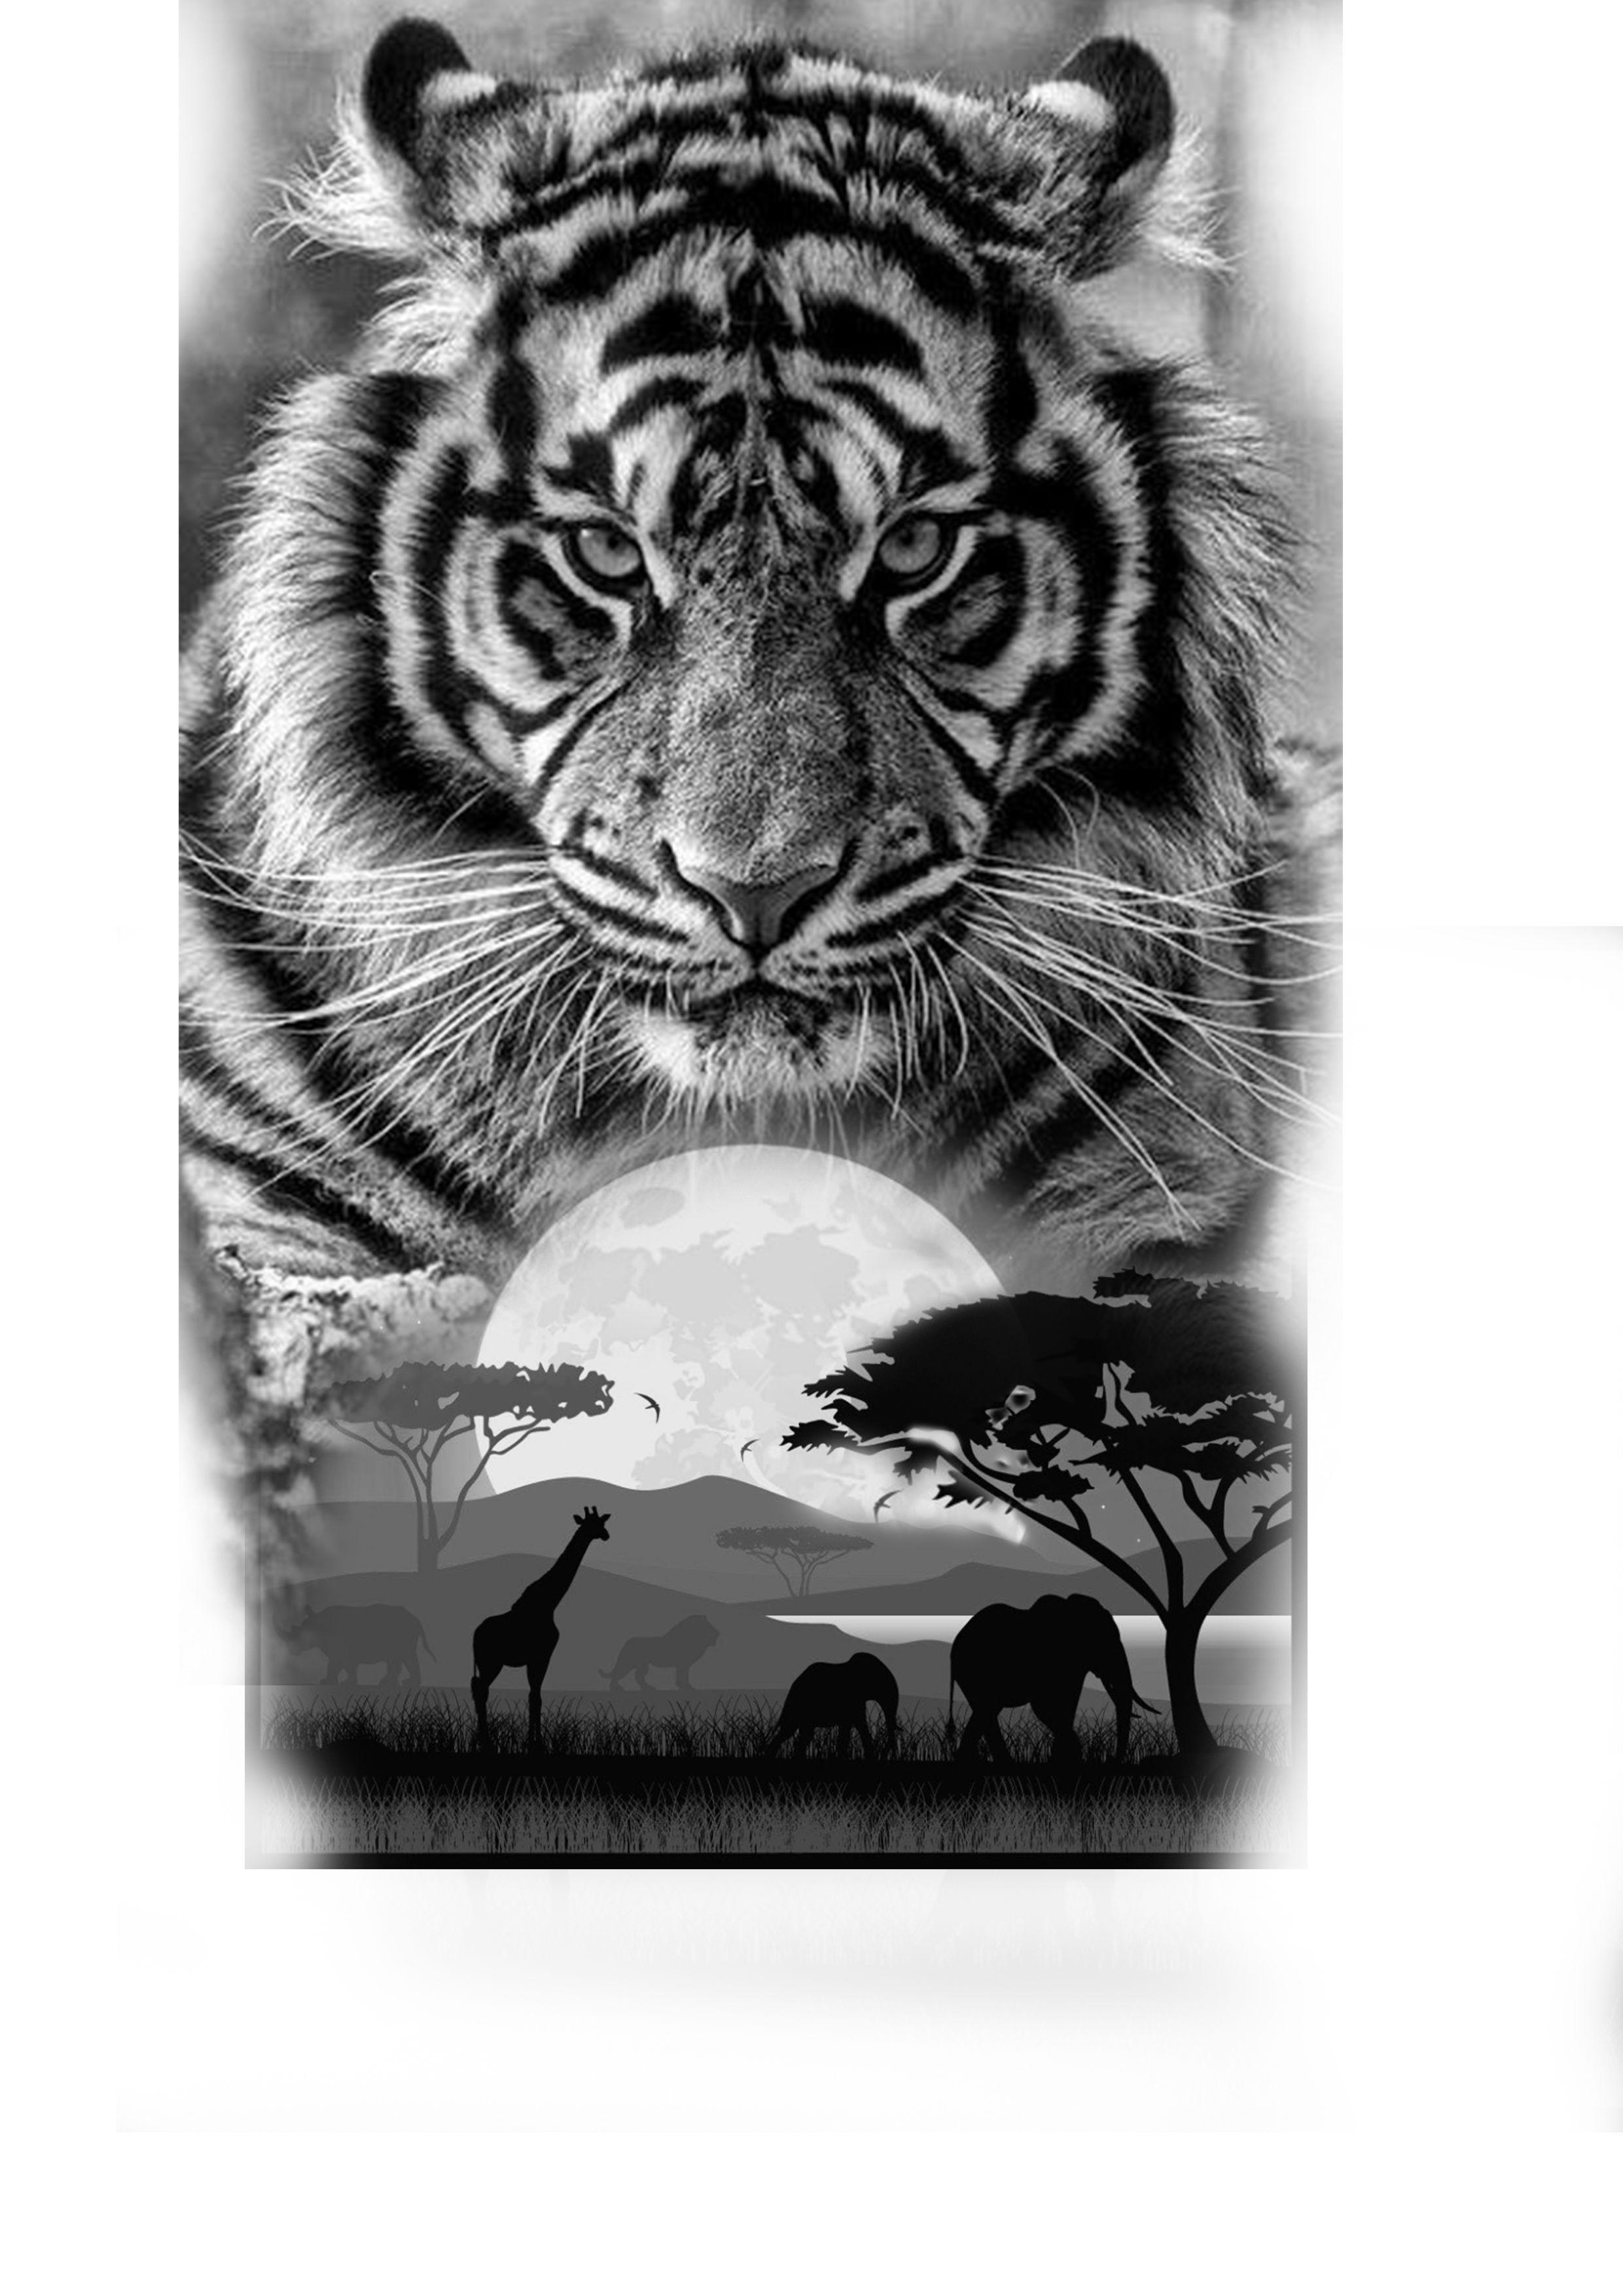 Best Tiger Tattoos Designs For Men Women Dragon And Tiger Tattoos On Back For Women Dragon Is Another As Tiger Tattoo Design Tiger Tattoo Sleeve Tiger Tattoo Tiger tattoo design wallpaper